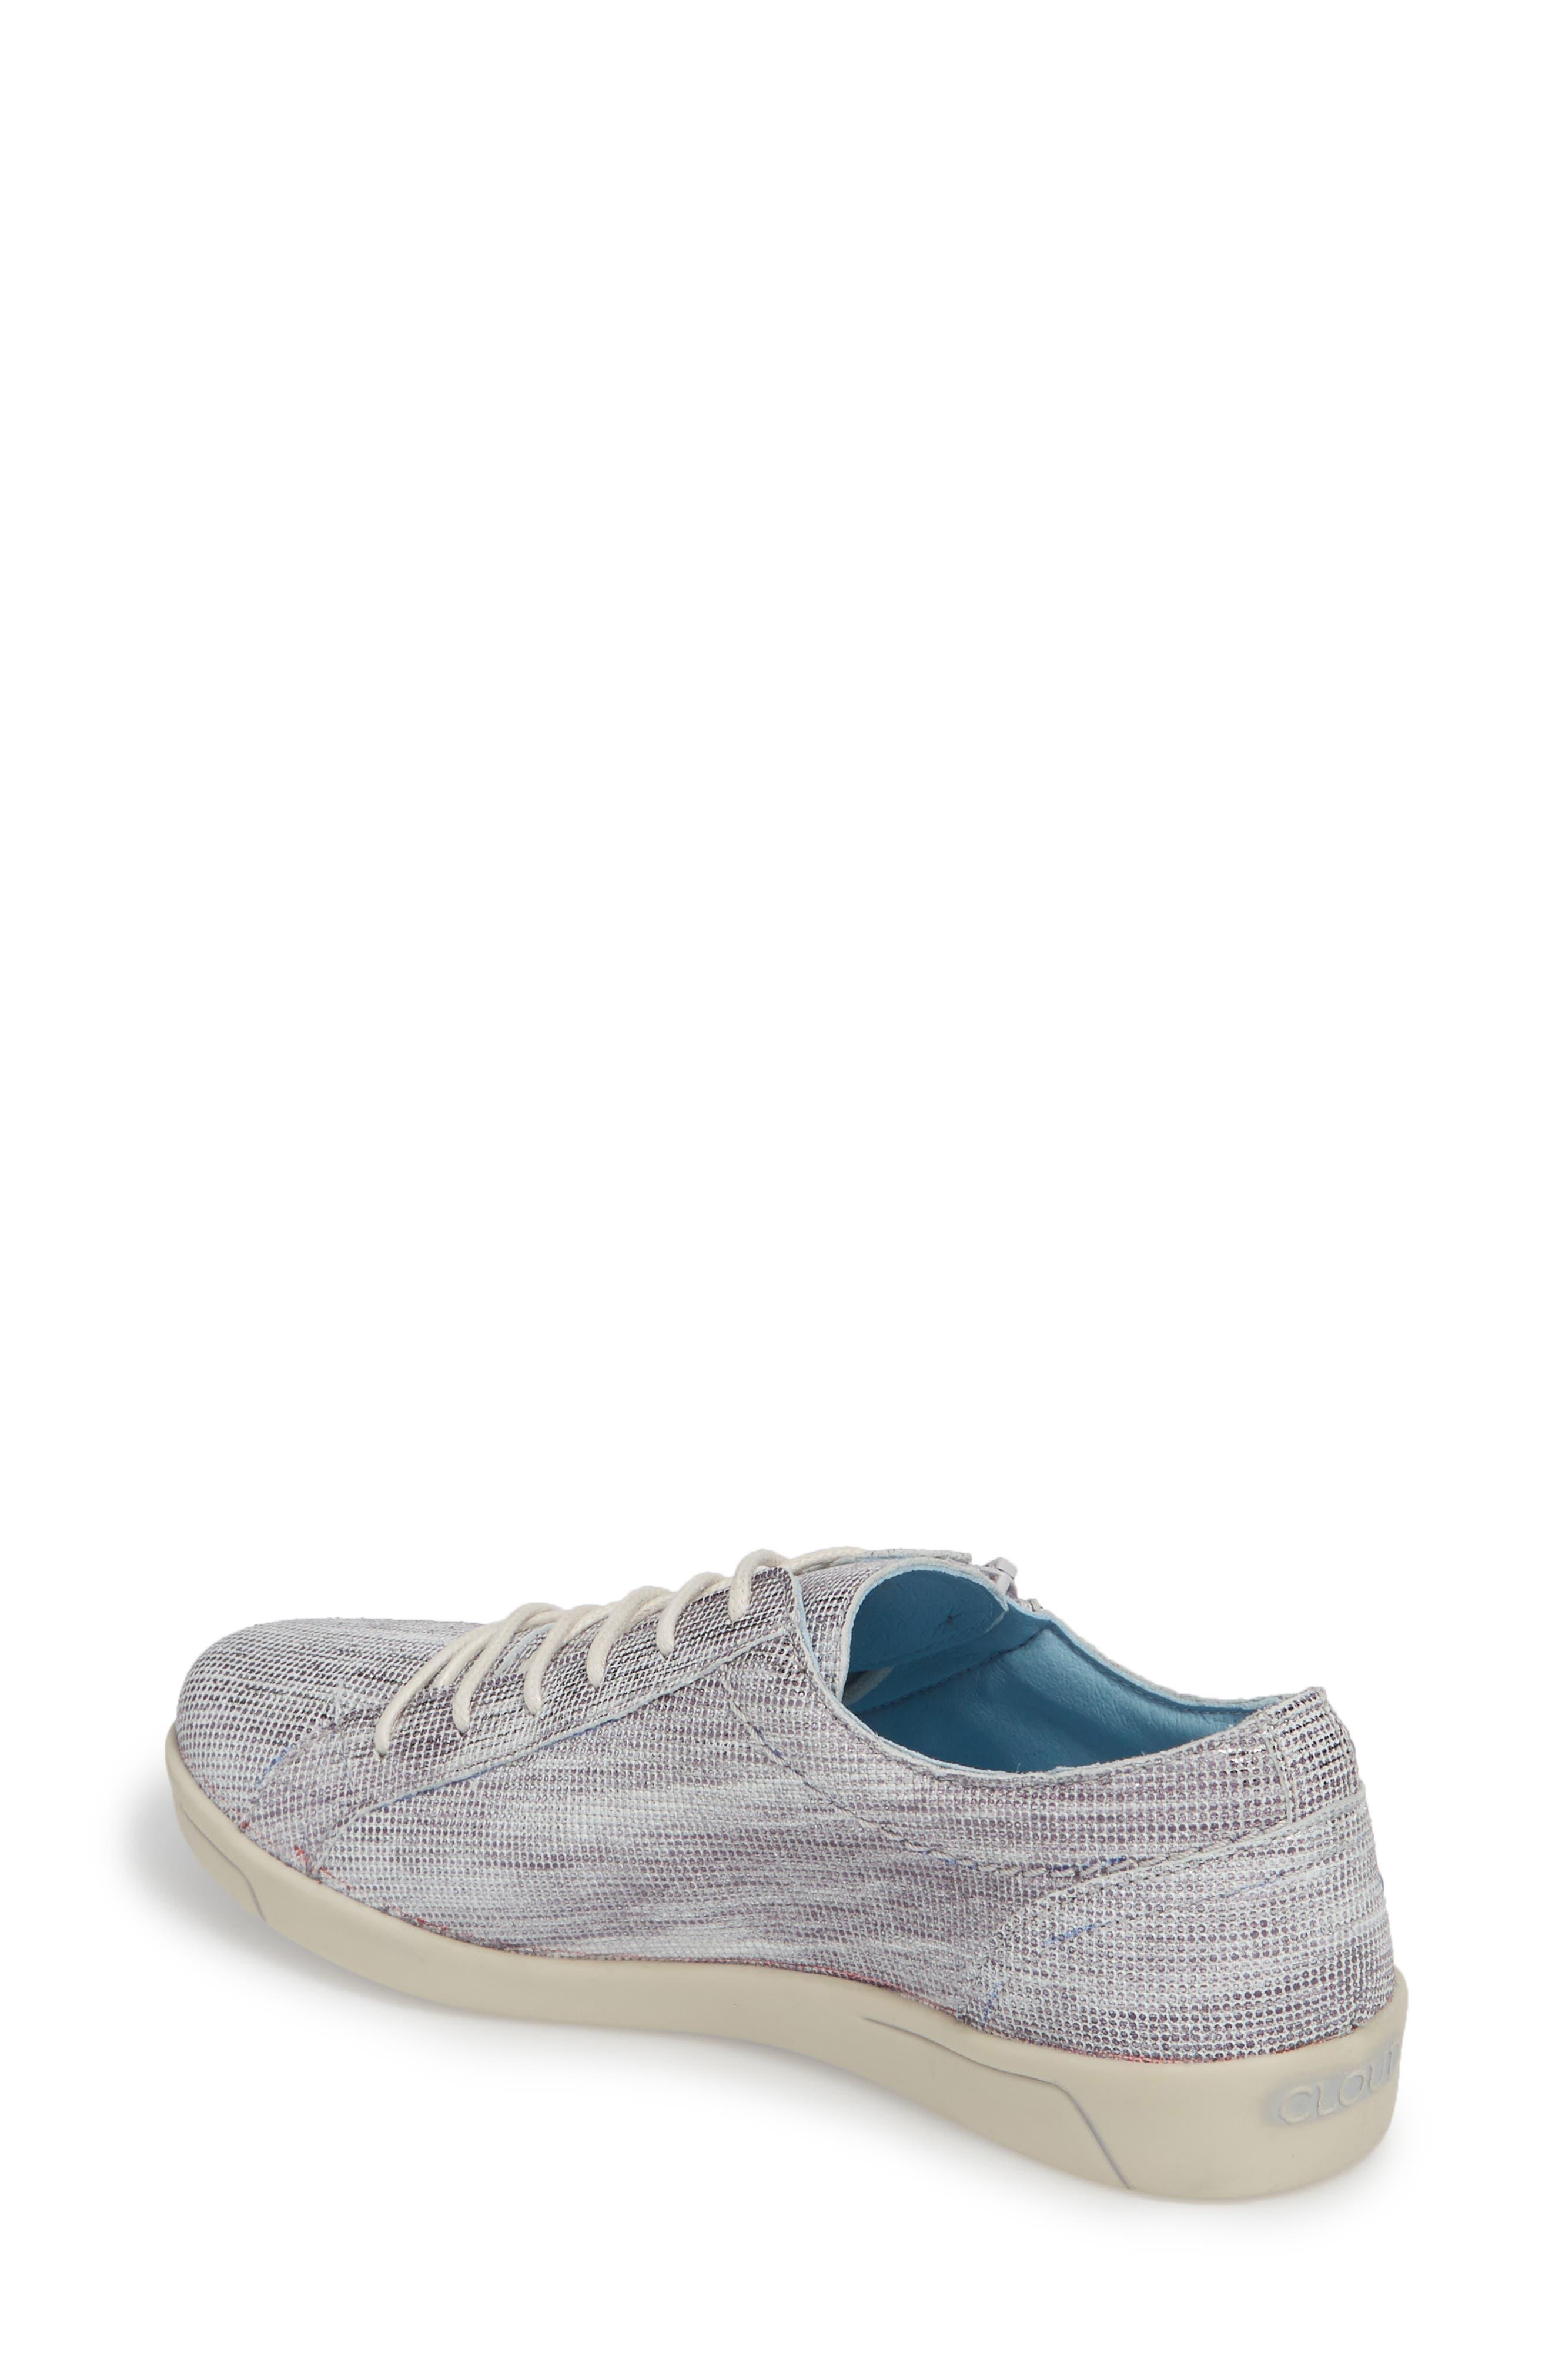 Aika Dunkan Sneaker,                             Alternate thumbnail 2, color,                             Grey Leather